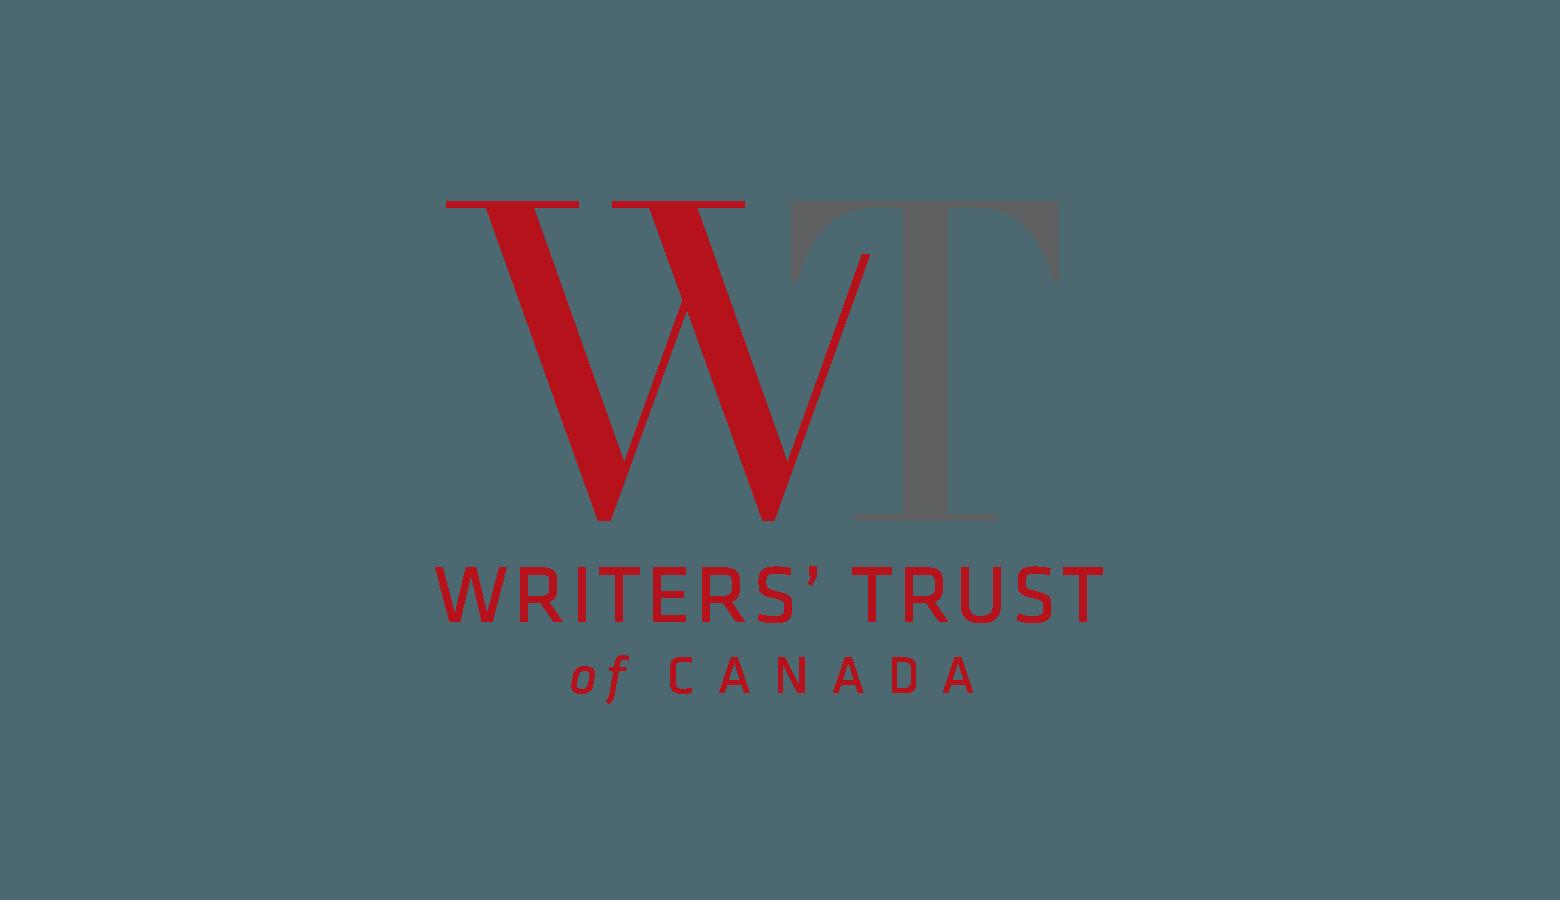 Writers' Trust